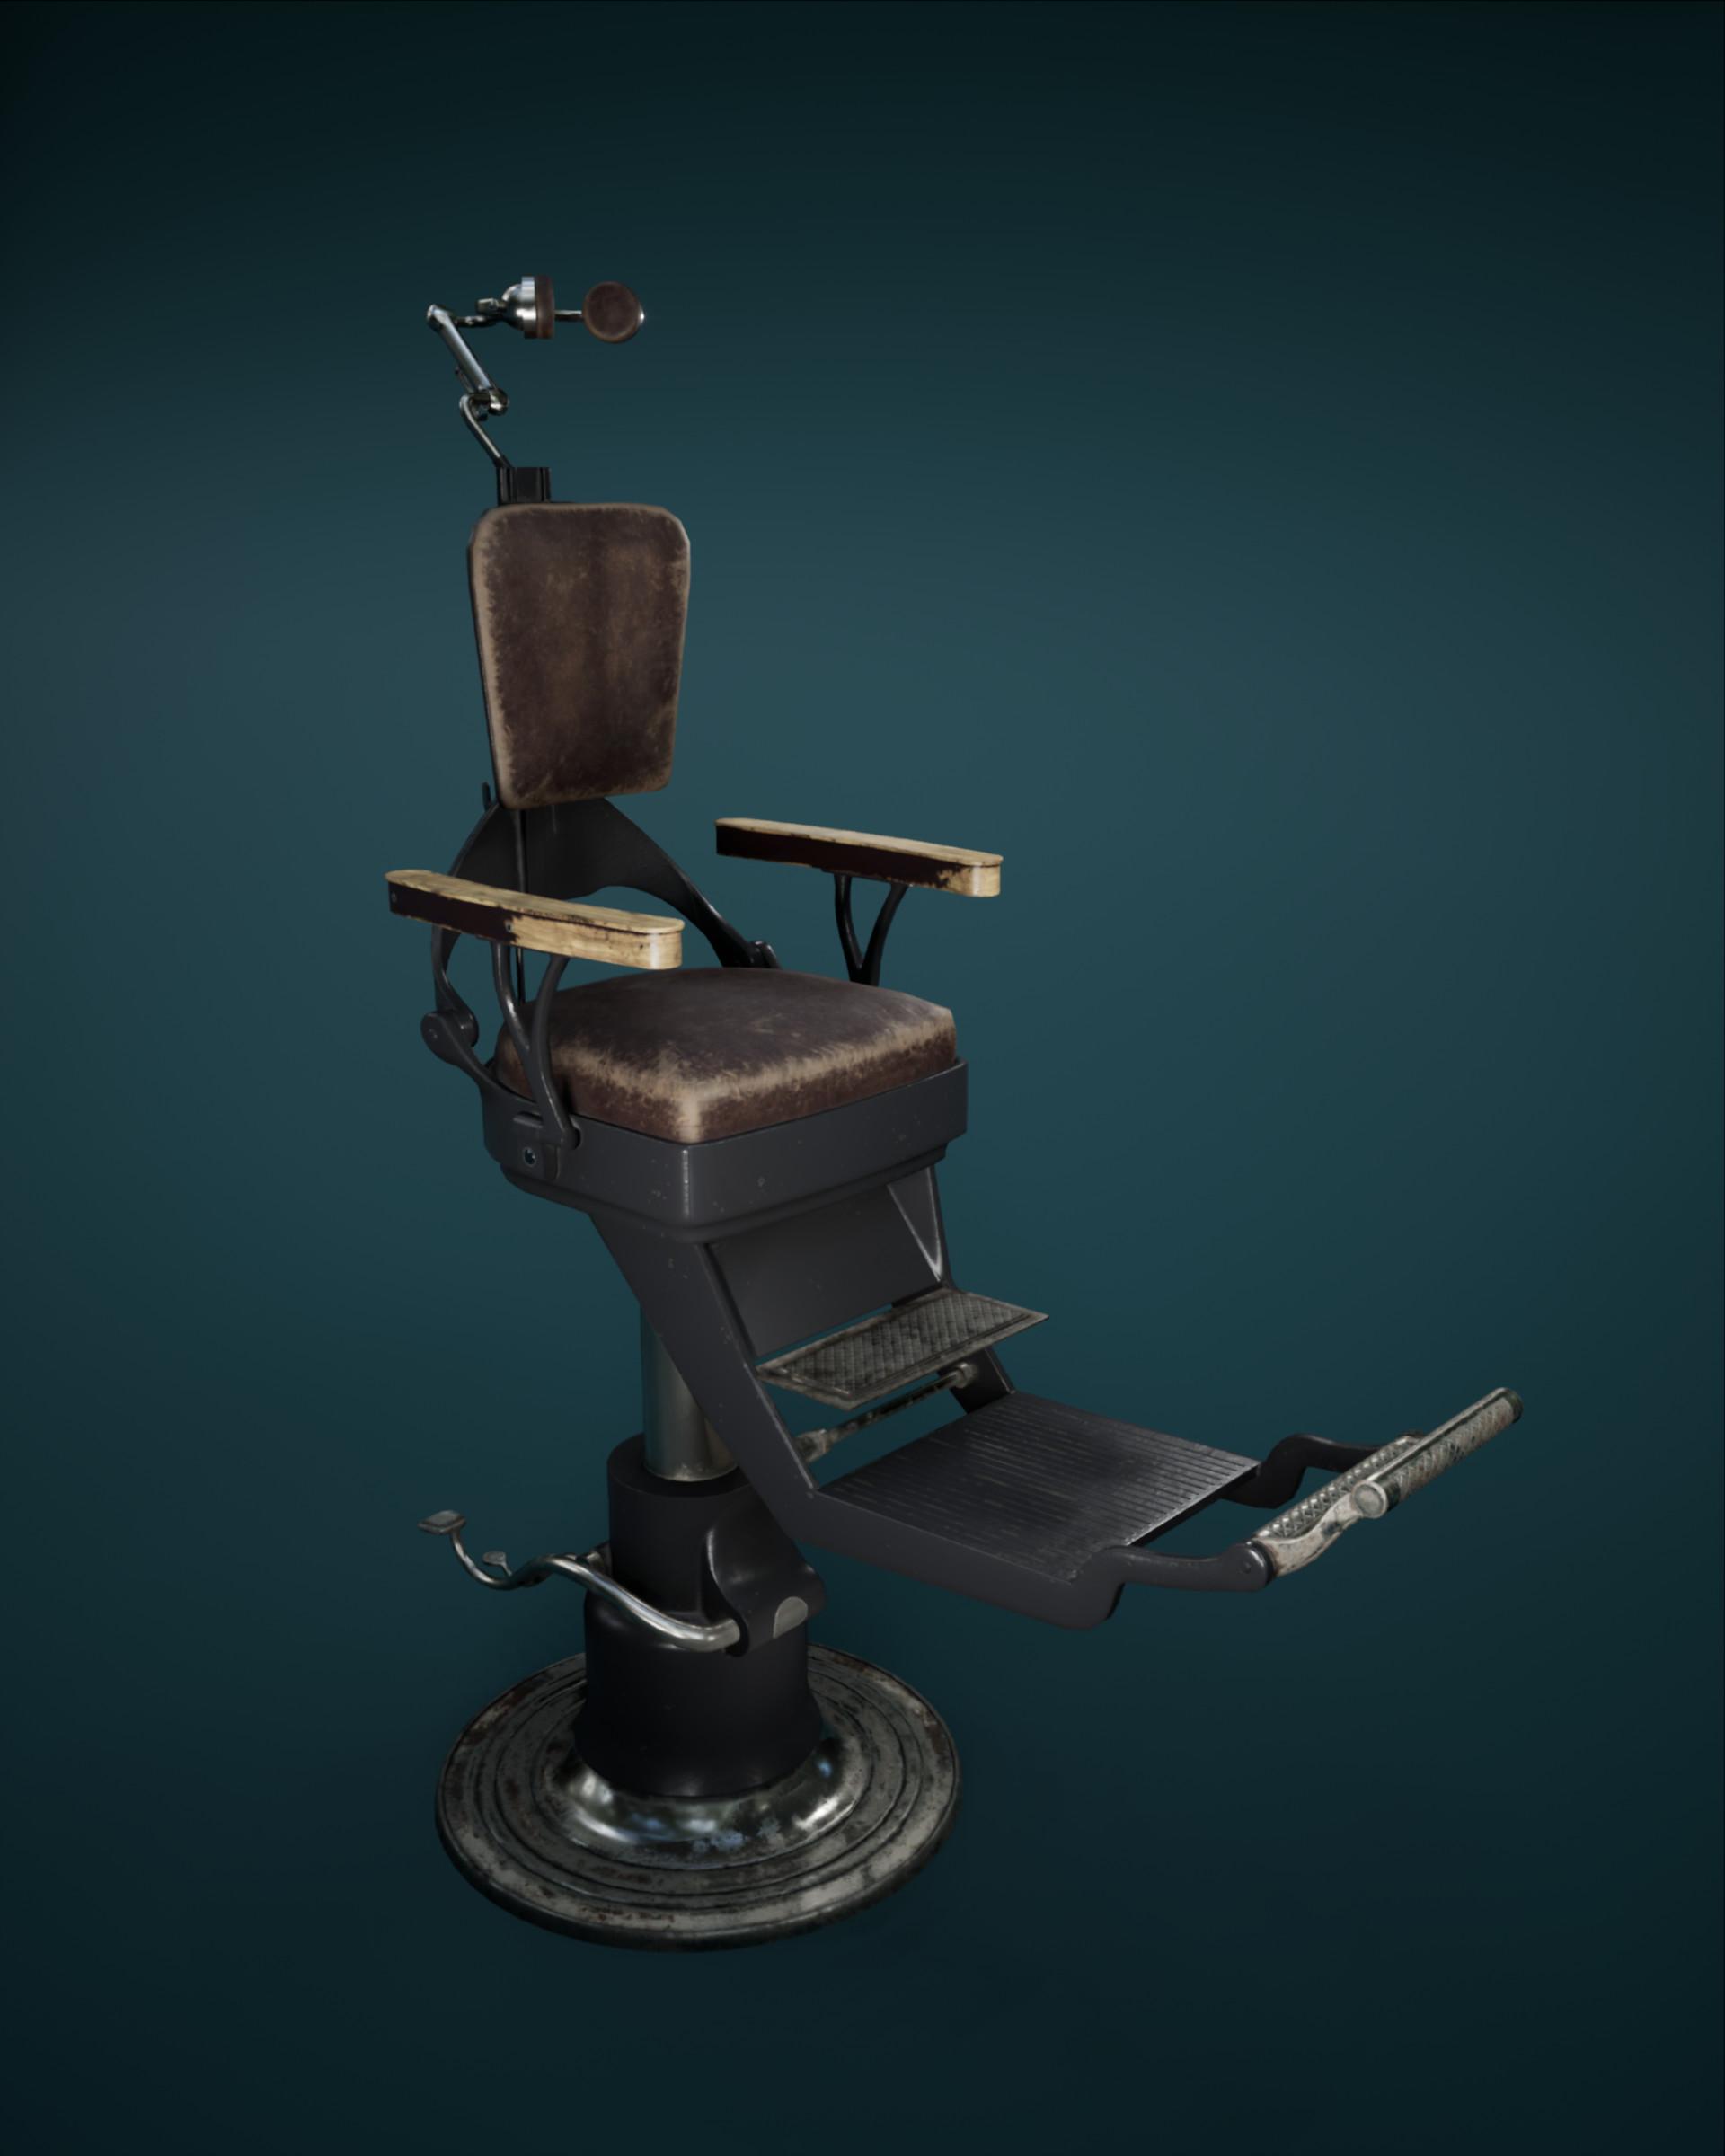 vintage dentist chair wicker outdoor chairs uk artstation dental annelien heyninck